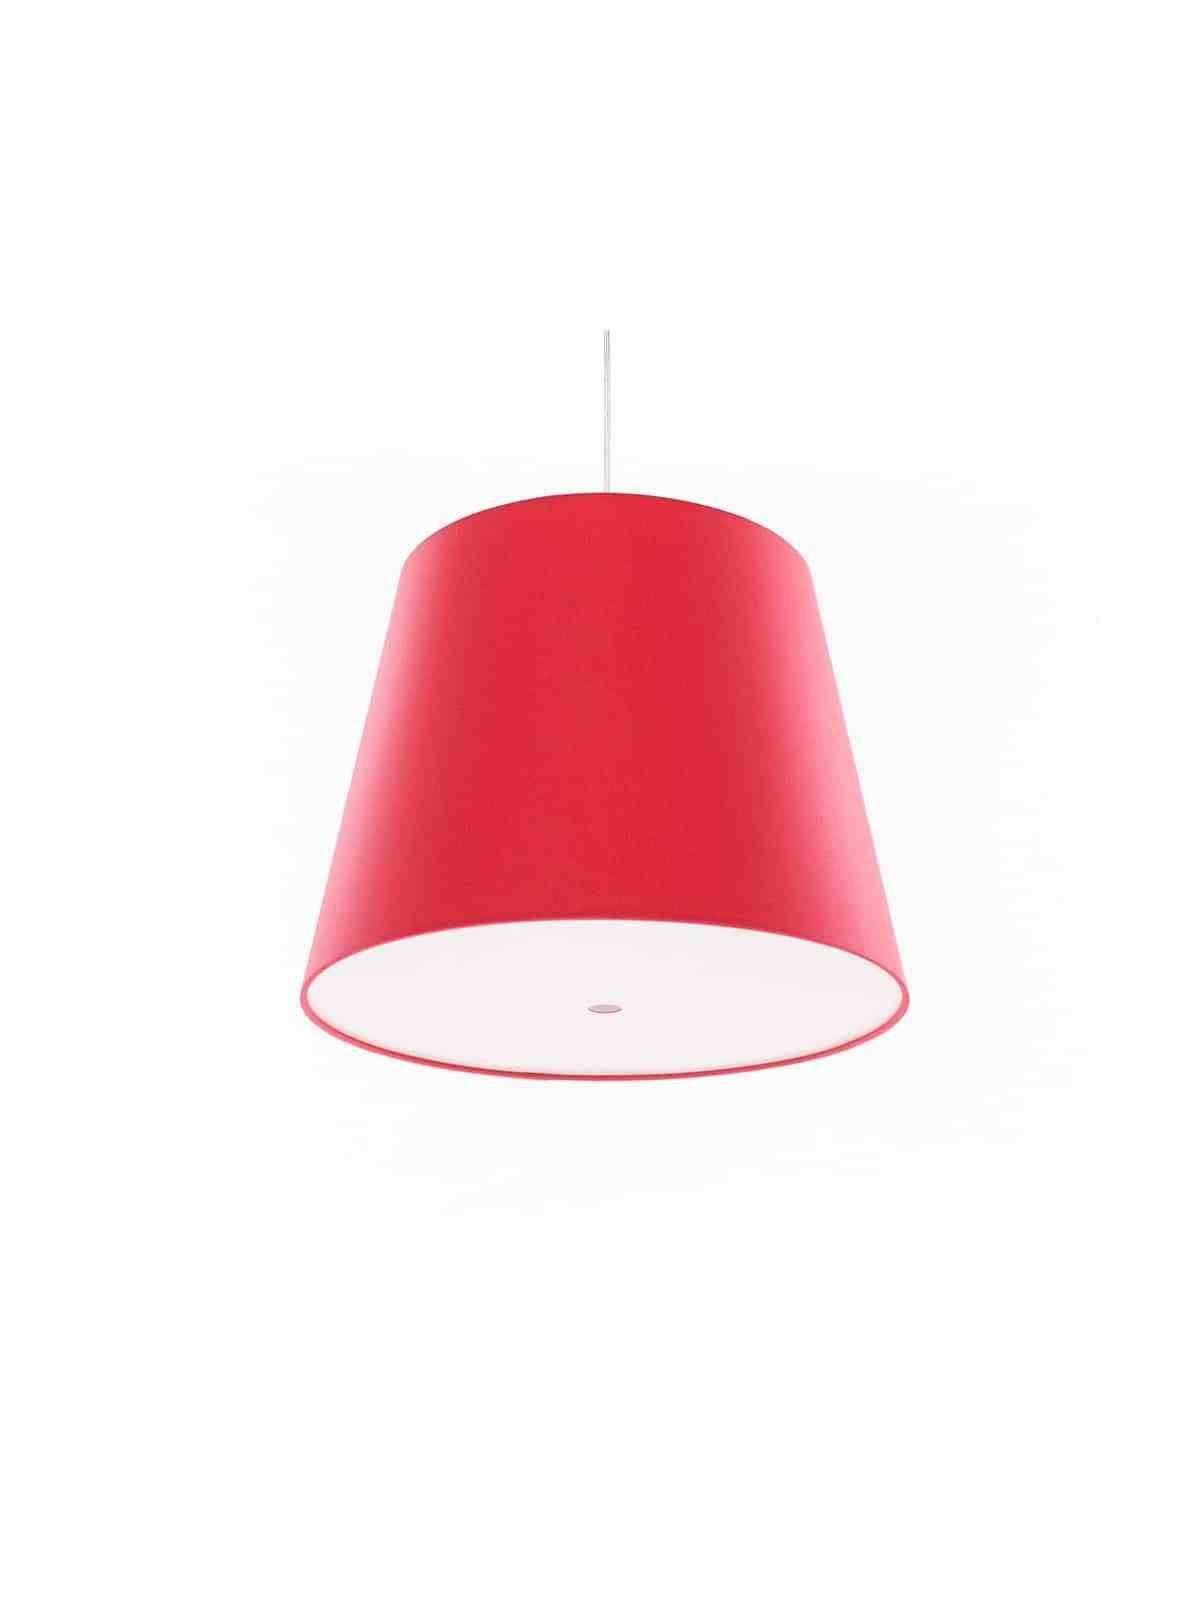 Bell Lampen Leuchten Designerleuchten Online Berlin Design Berlin Design Lampen Und Leuchten Lampen